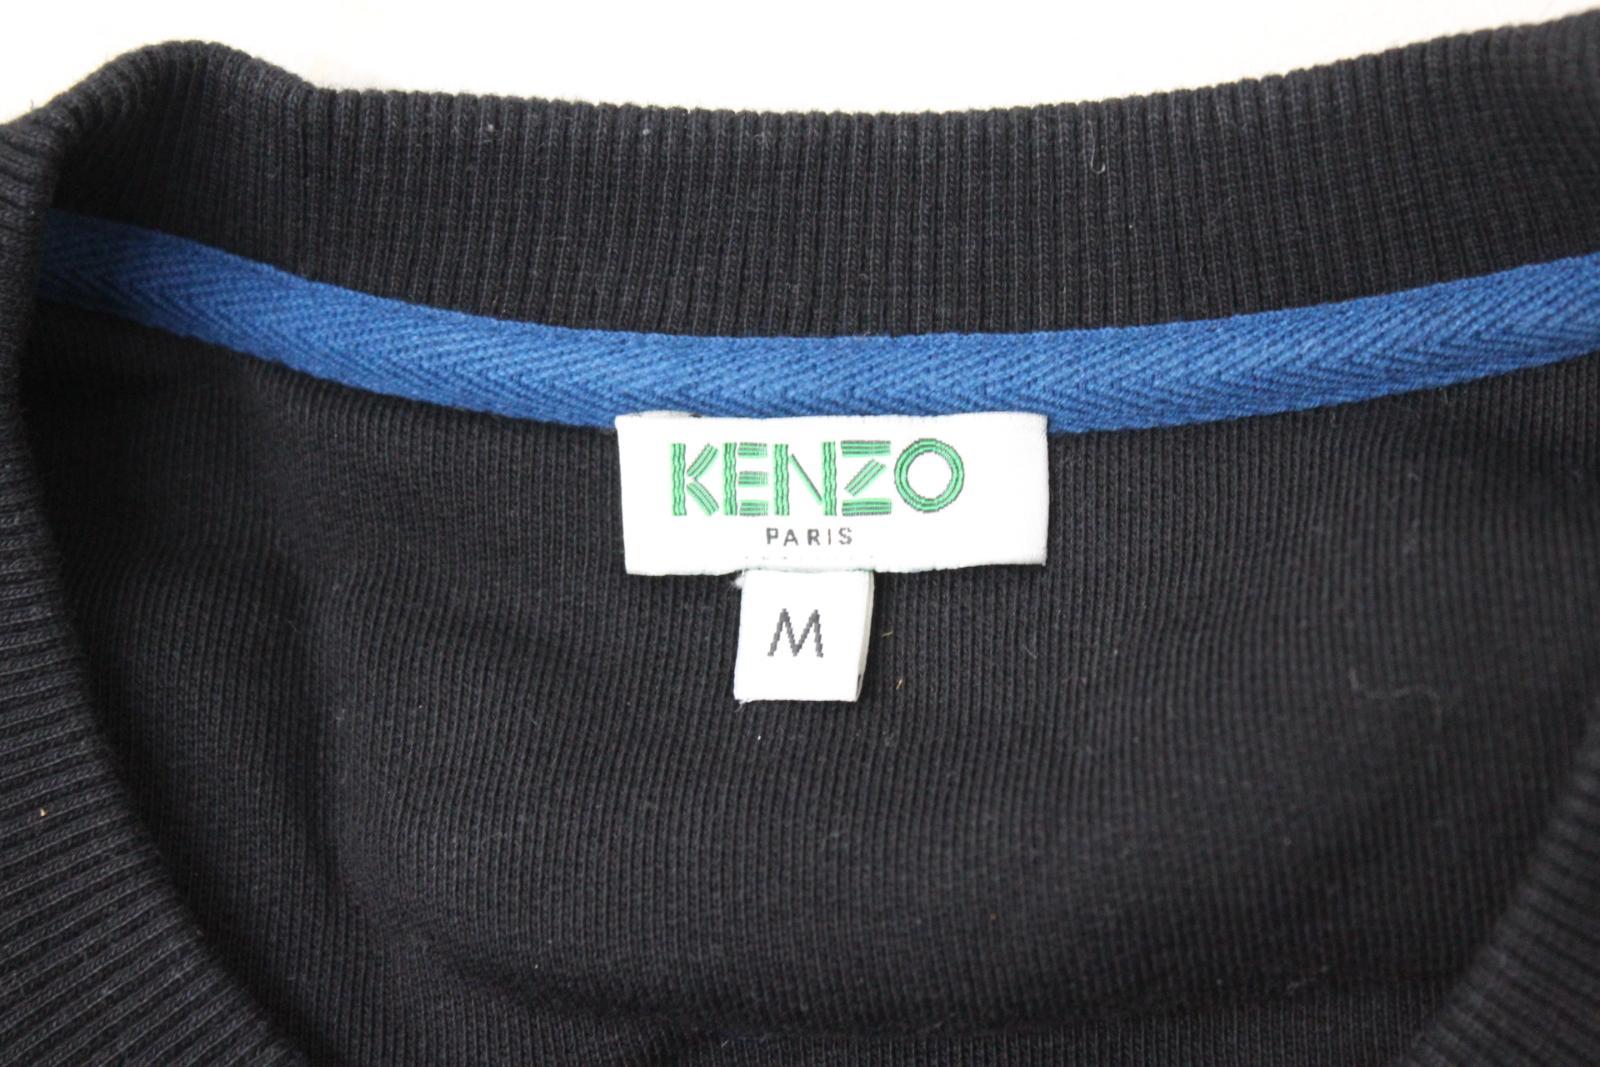 3c7c32ed KENZO Men's Black & Blue Tiger Head Logo Crew Neck Jumper Sweatshirt Size M  7 7 of 12 ...